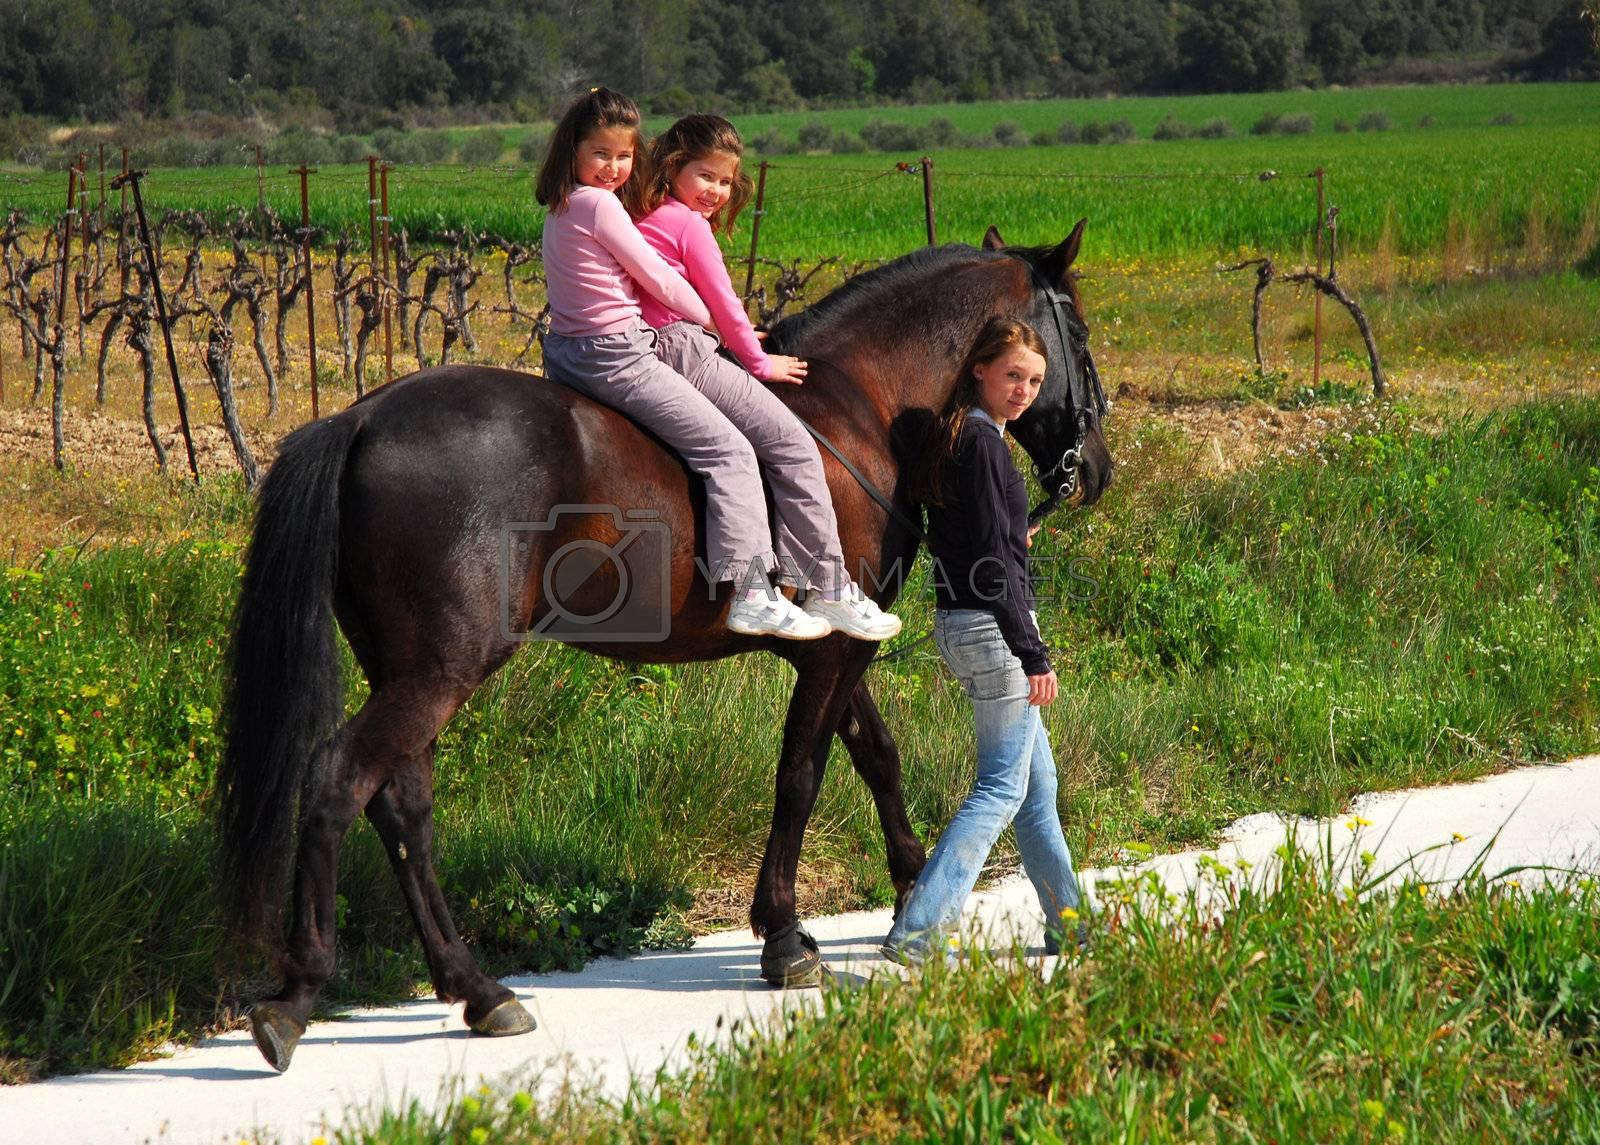 twins sisters horseback riding a black stallion